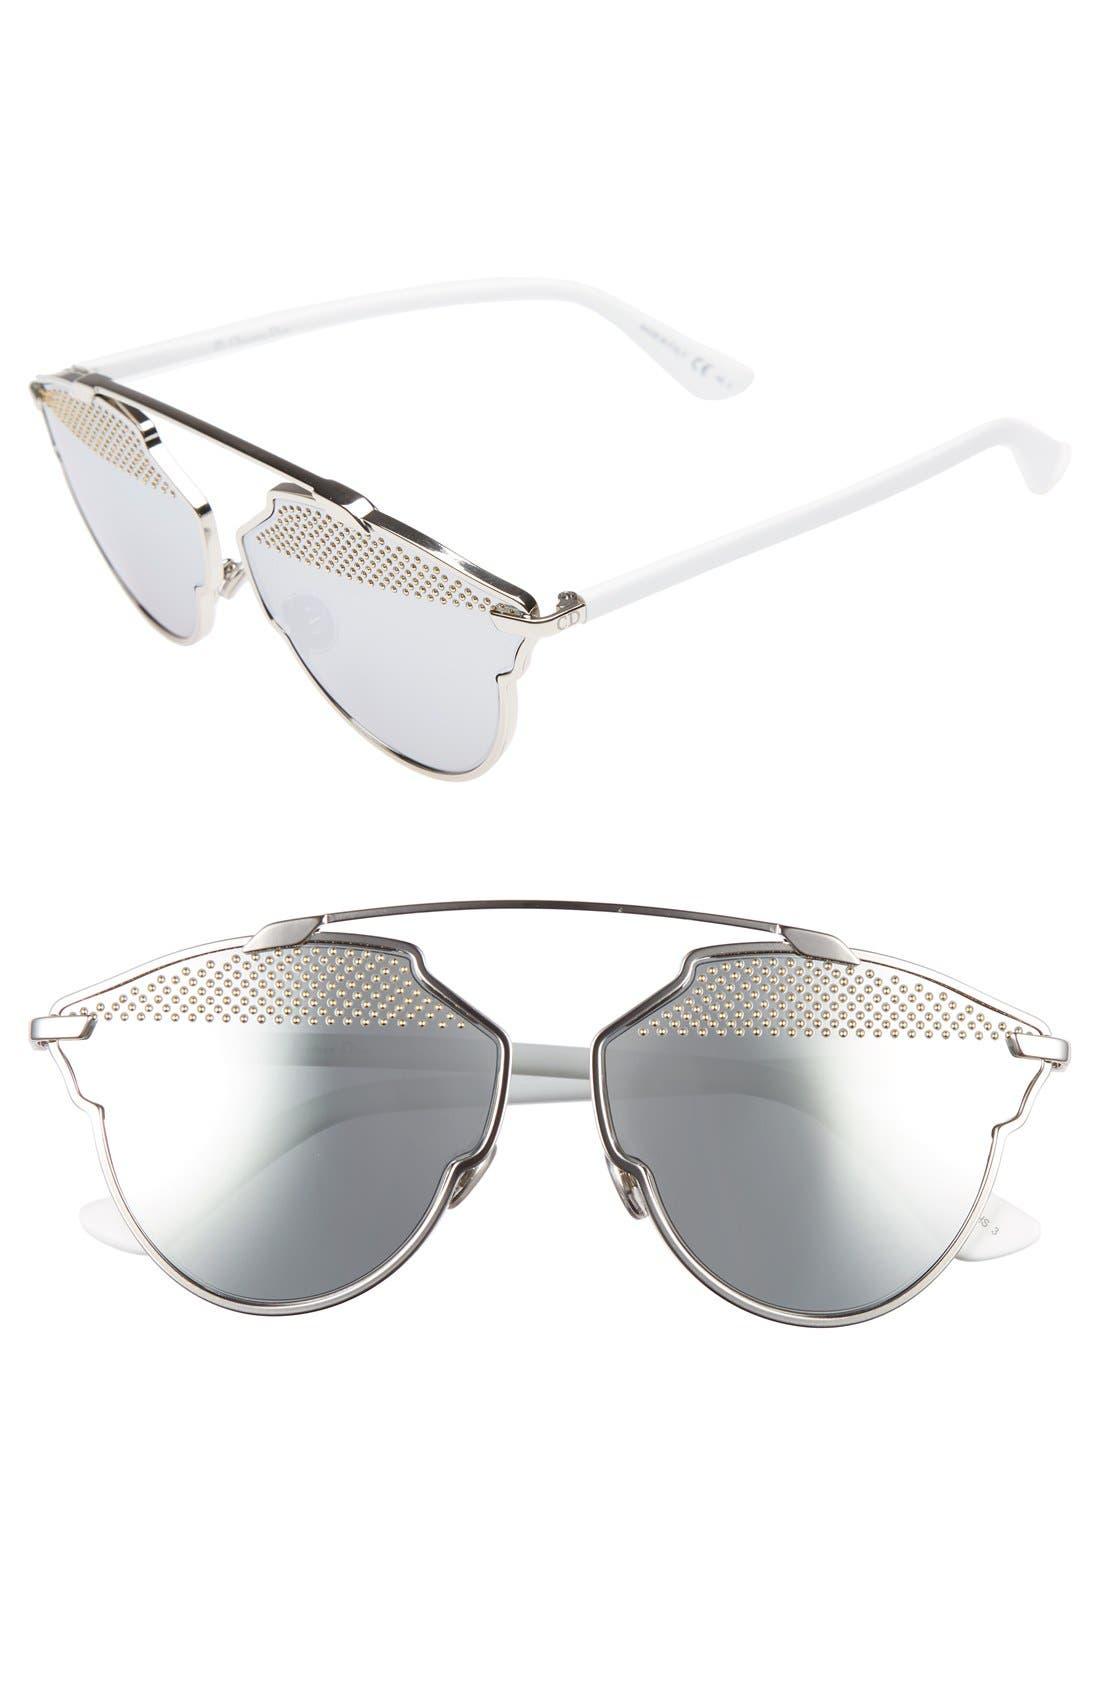 Image of Dior Women's 59mm So Real Stud Brow Bar Sunglasses